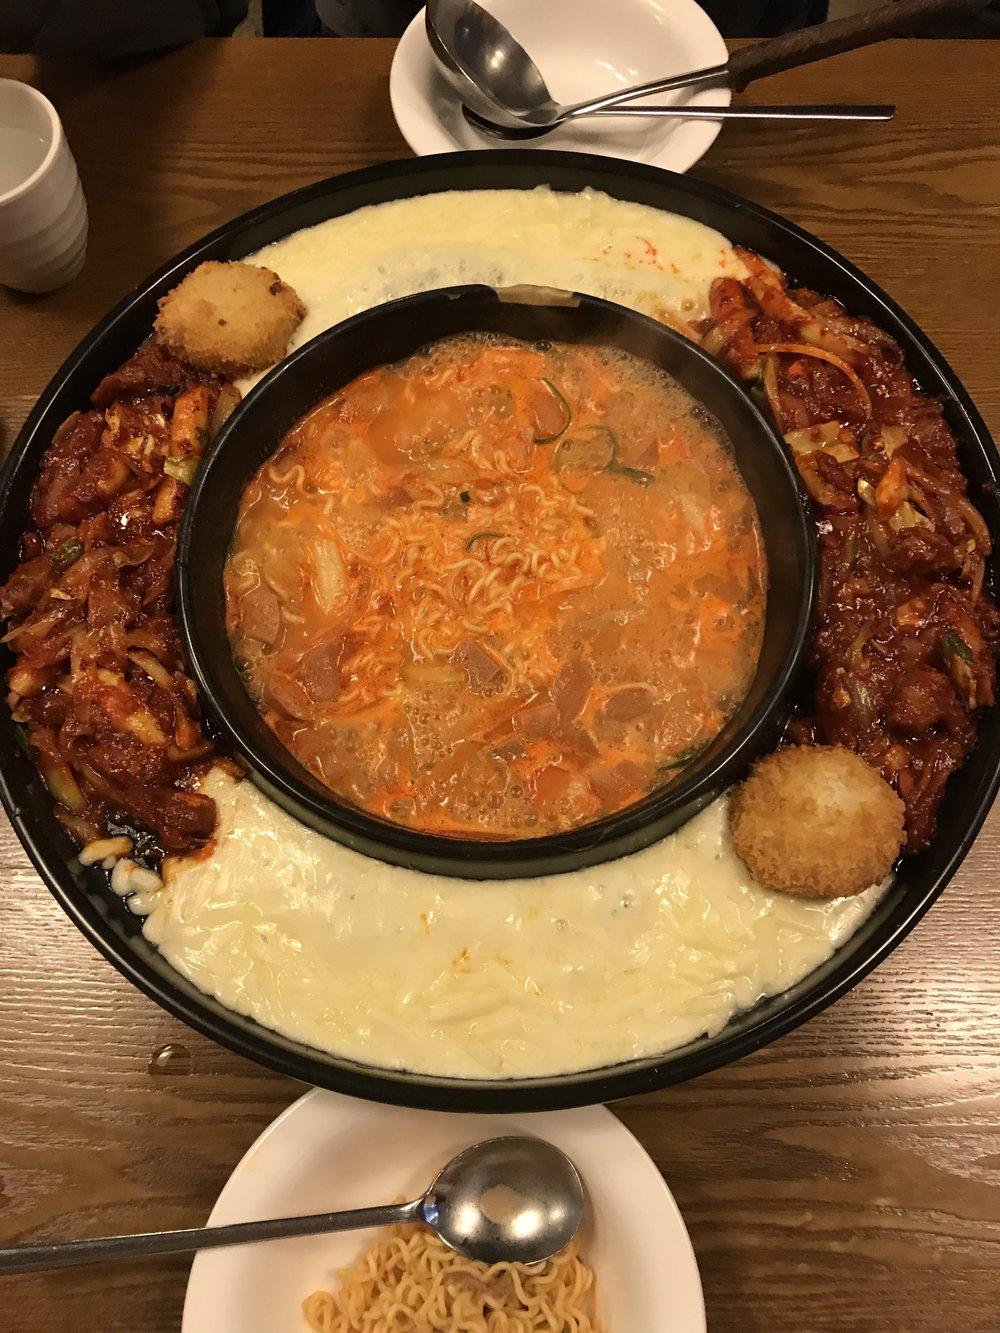 Budae Jjigae - @ Simpson Tang 355-21 Seogyo-dong, Mapo-gu, Seoul, South Korea